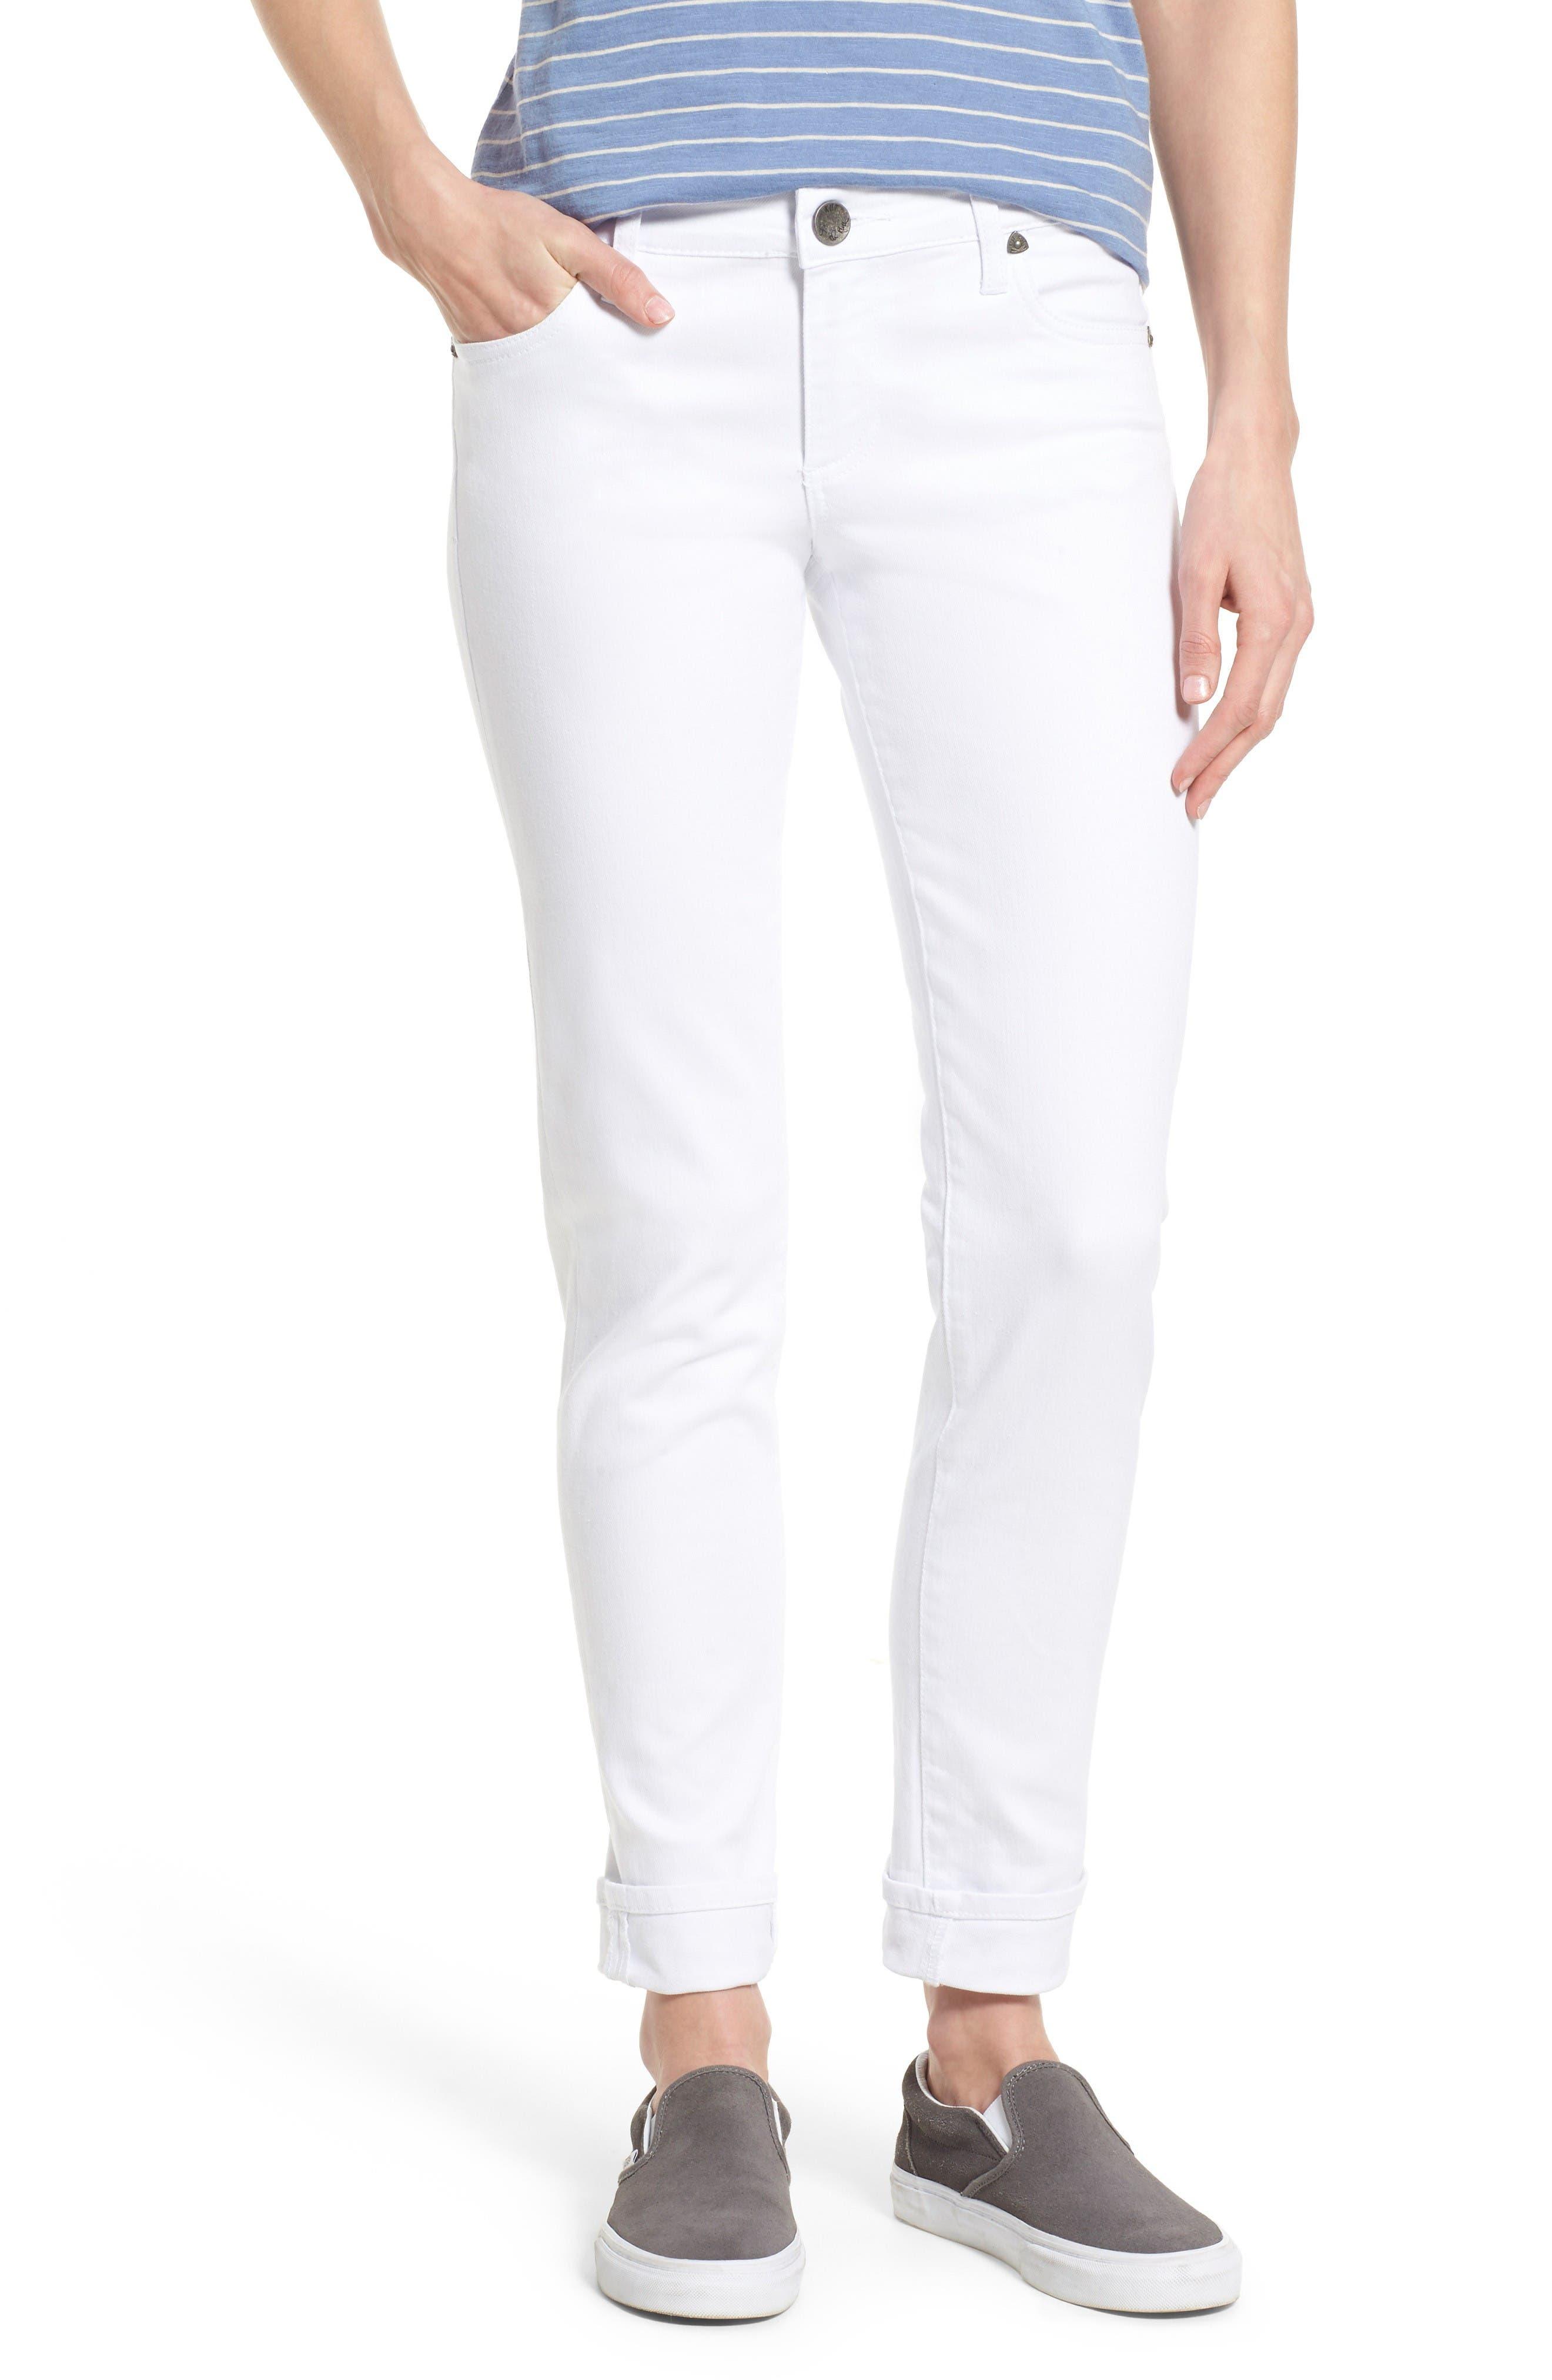 Catherine Stretch Boyfriend Jeans,                         Main,                         color, White